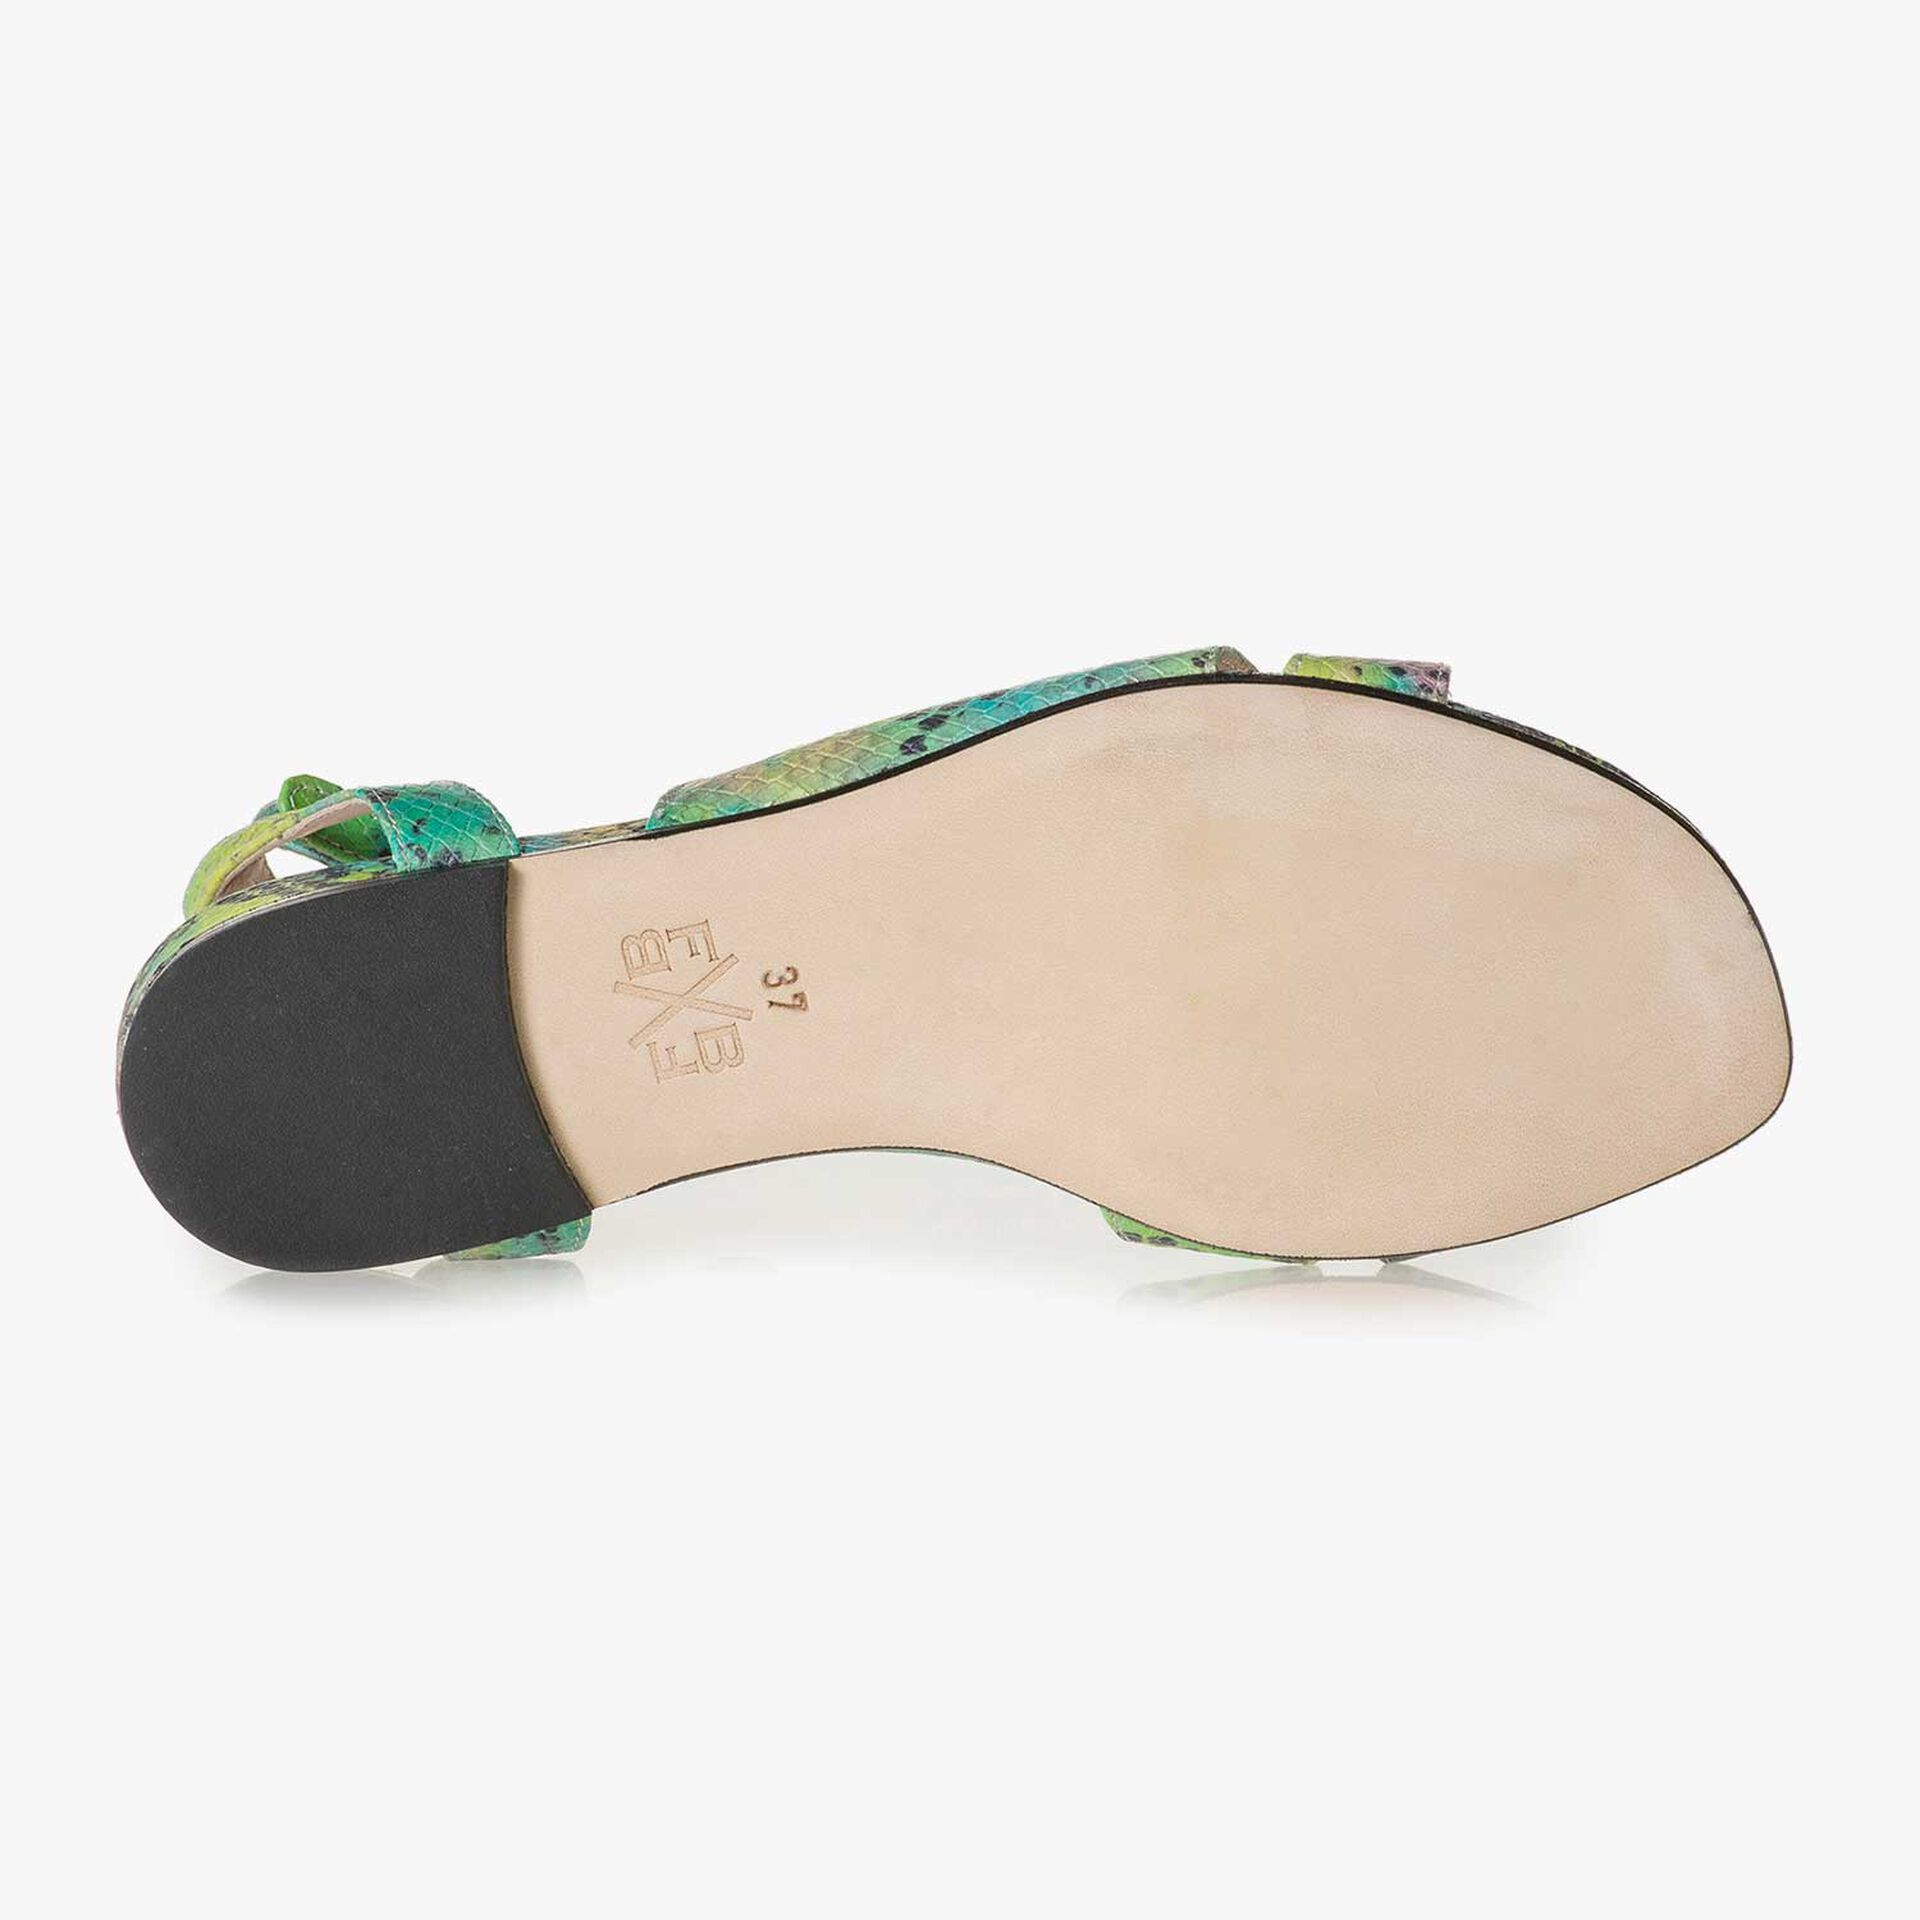 Grüne Leder-Sandale mit Schlangenprint